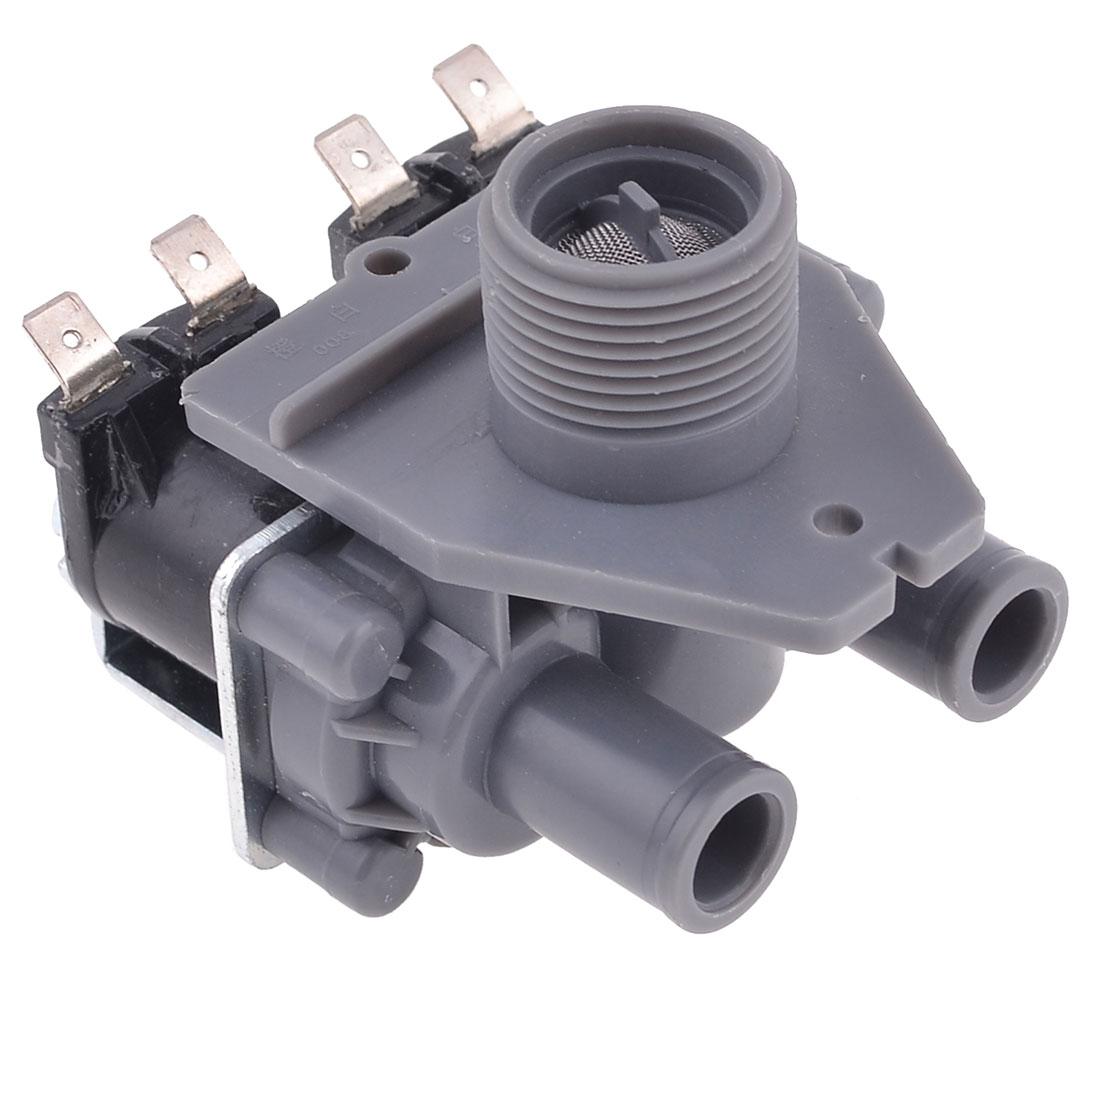 "AC 220-240V 1.1"" Thread Diameter Washing Machine Solenoid Valve Grey Black"